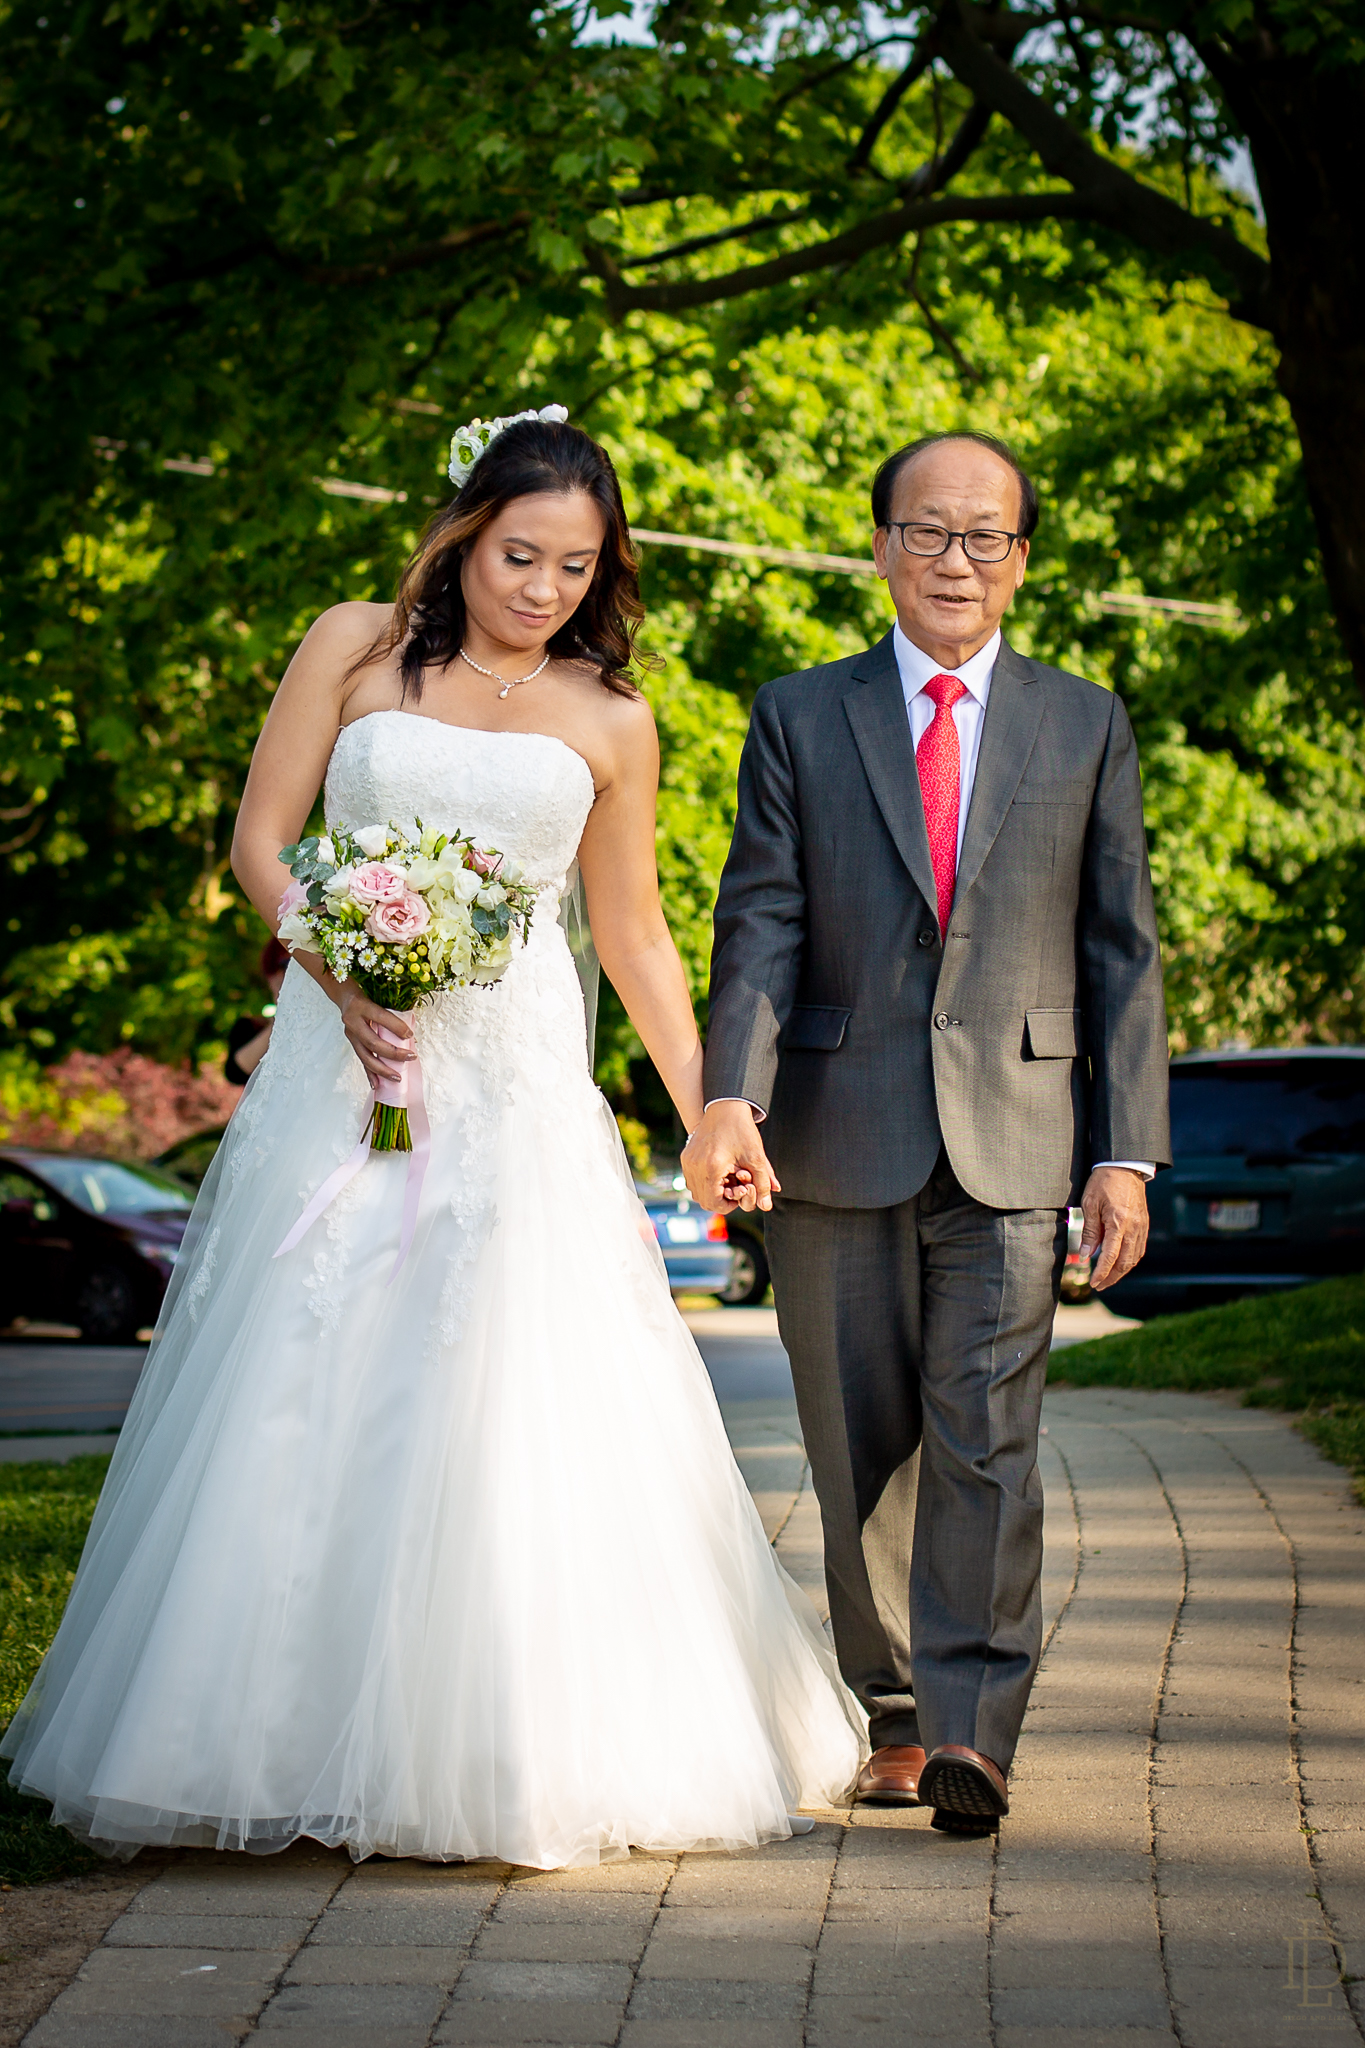 Toronto-wedding-Photograper-32.jpg